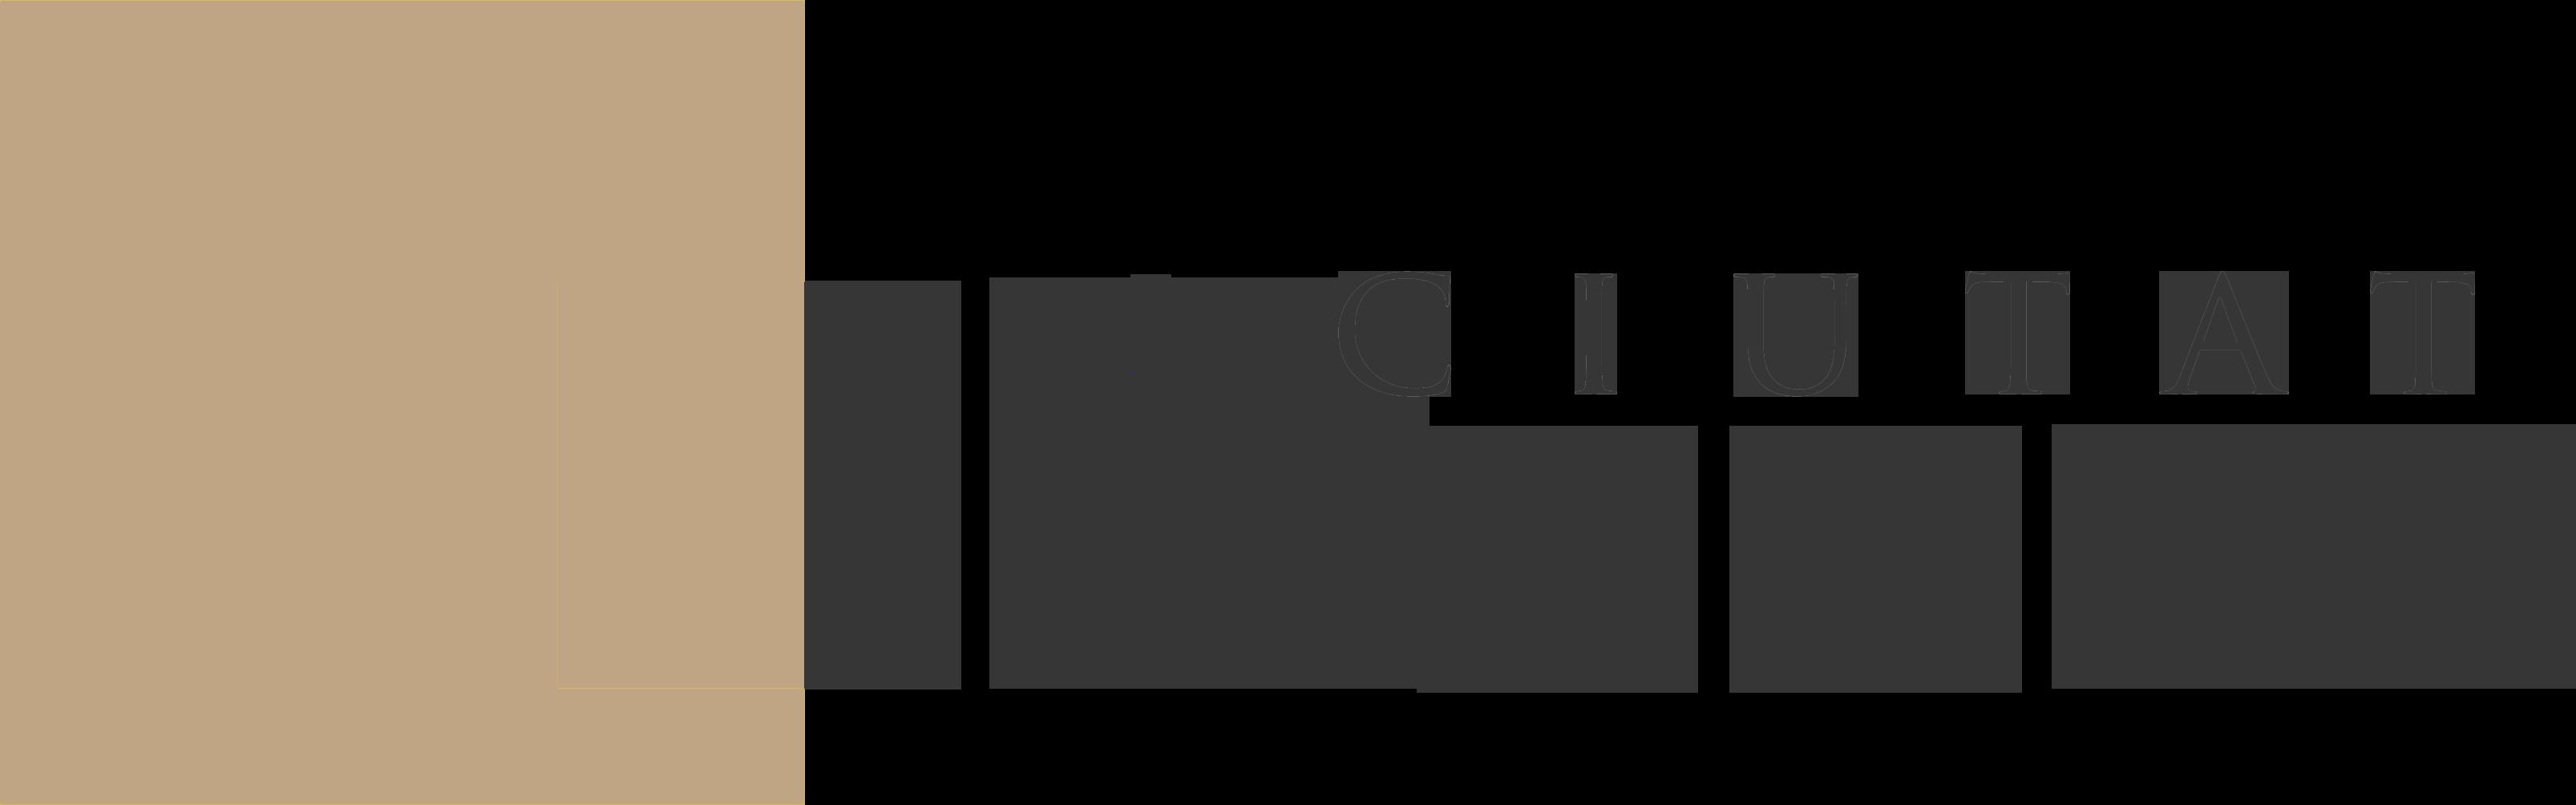 Ciutat Agora